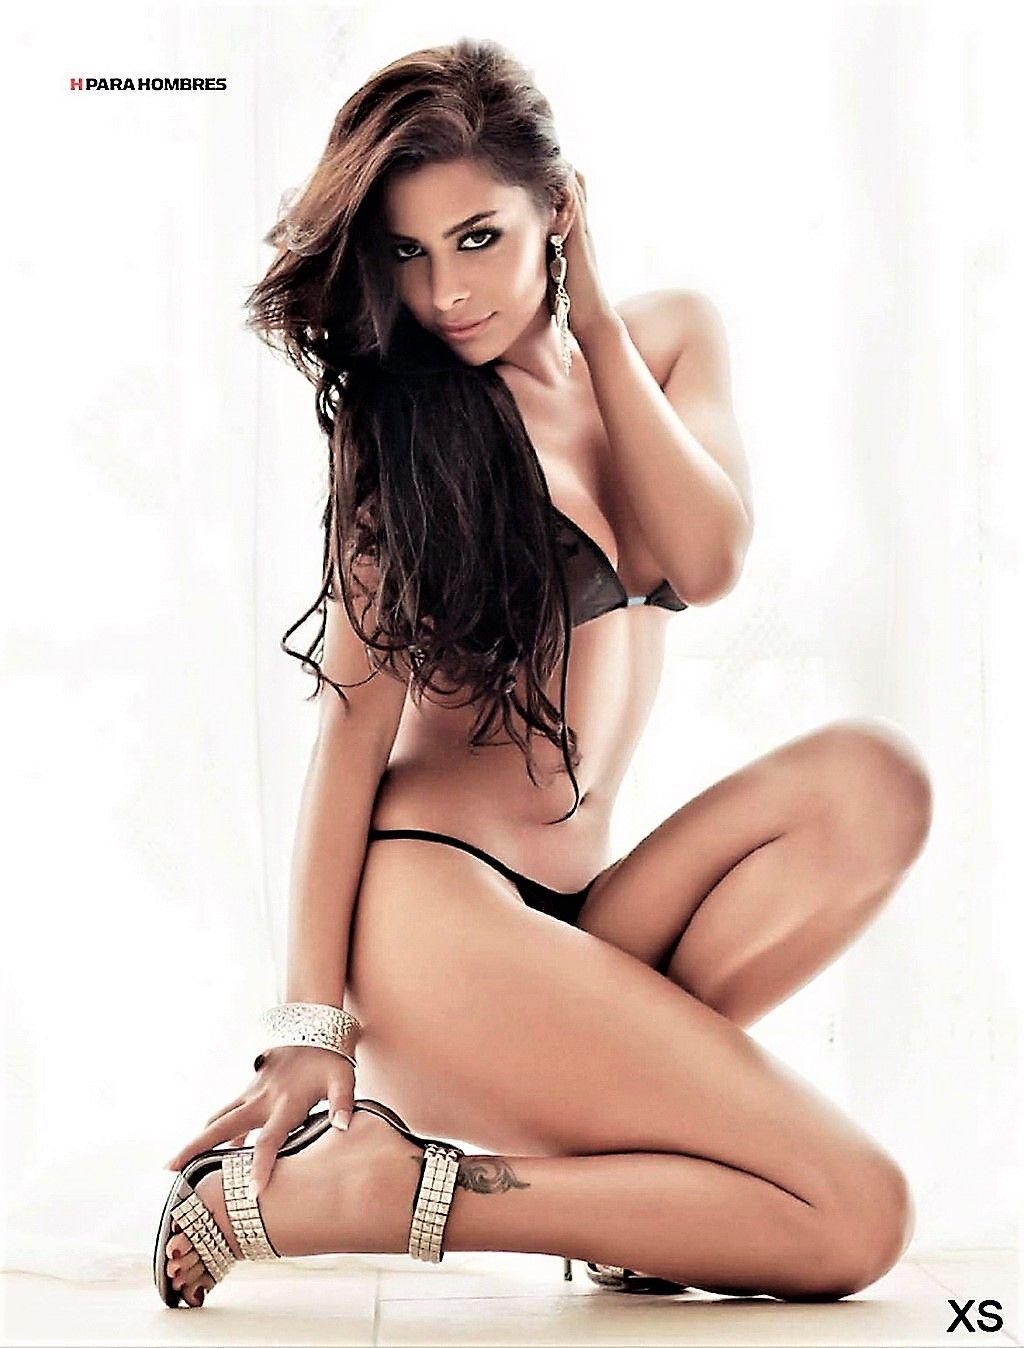 Snapchat Larissa Riquelme nudes (46 pics), Leaked